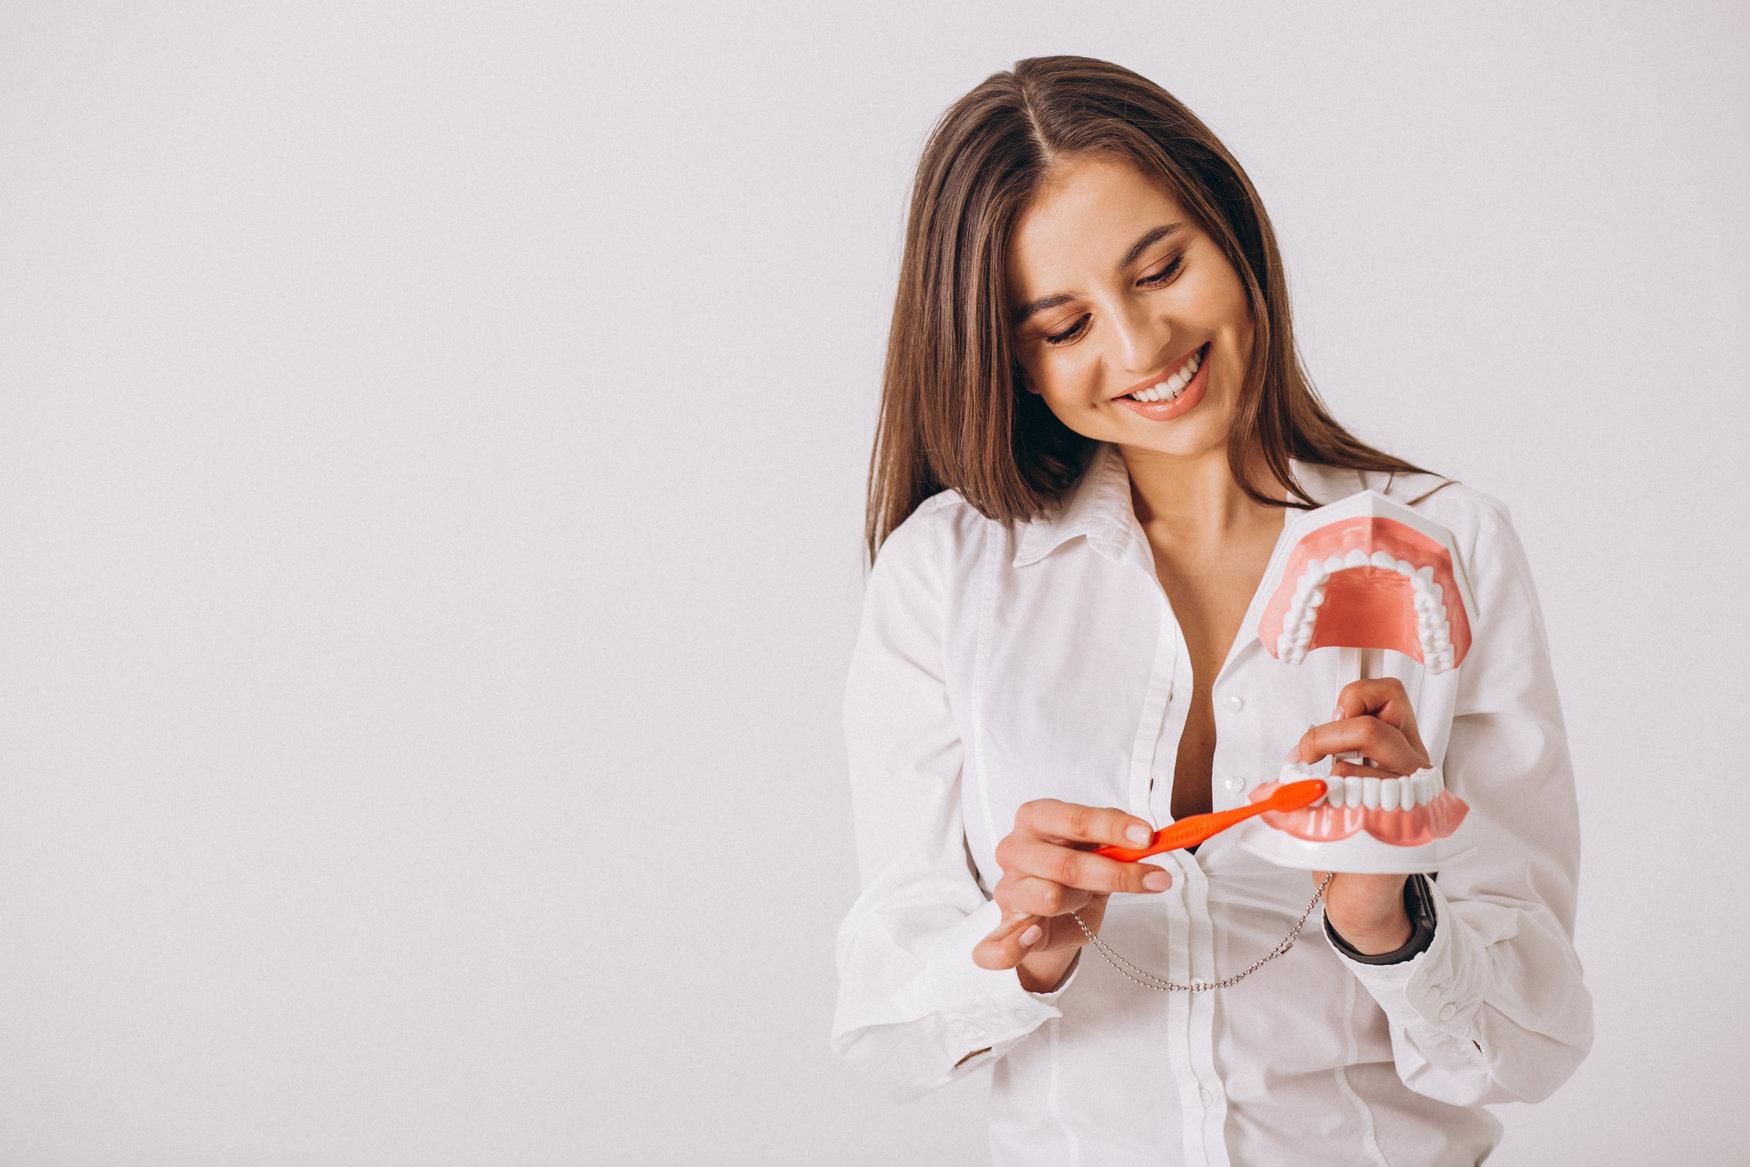 woman brushing a set of prosthetic teeth